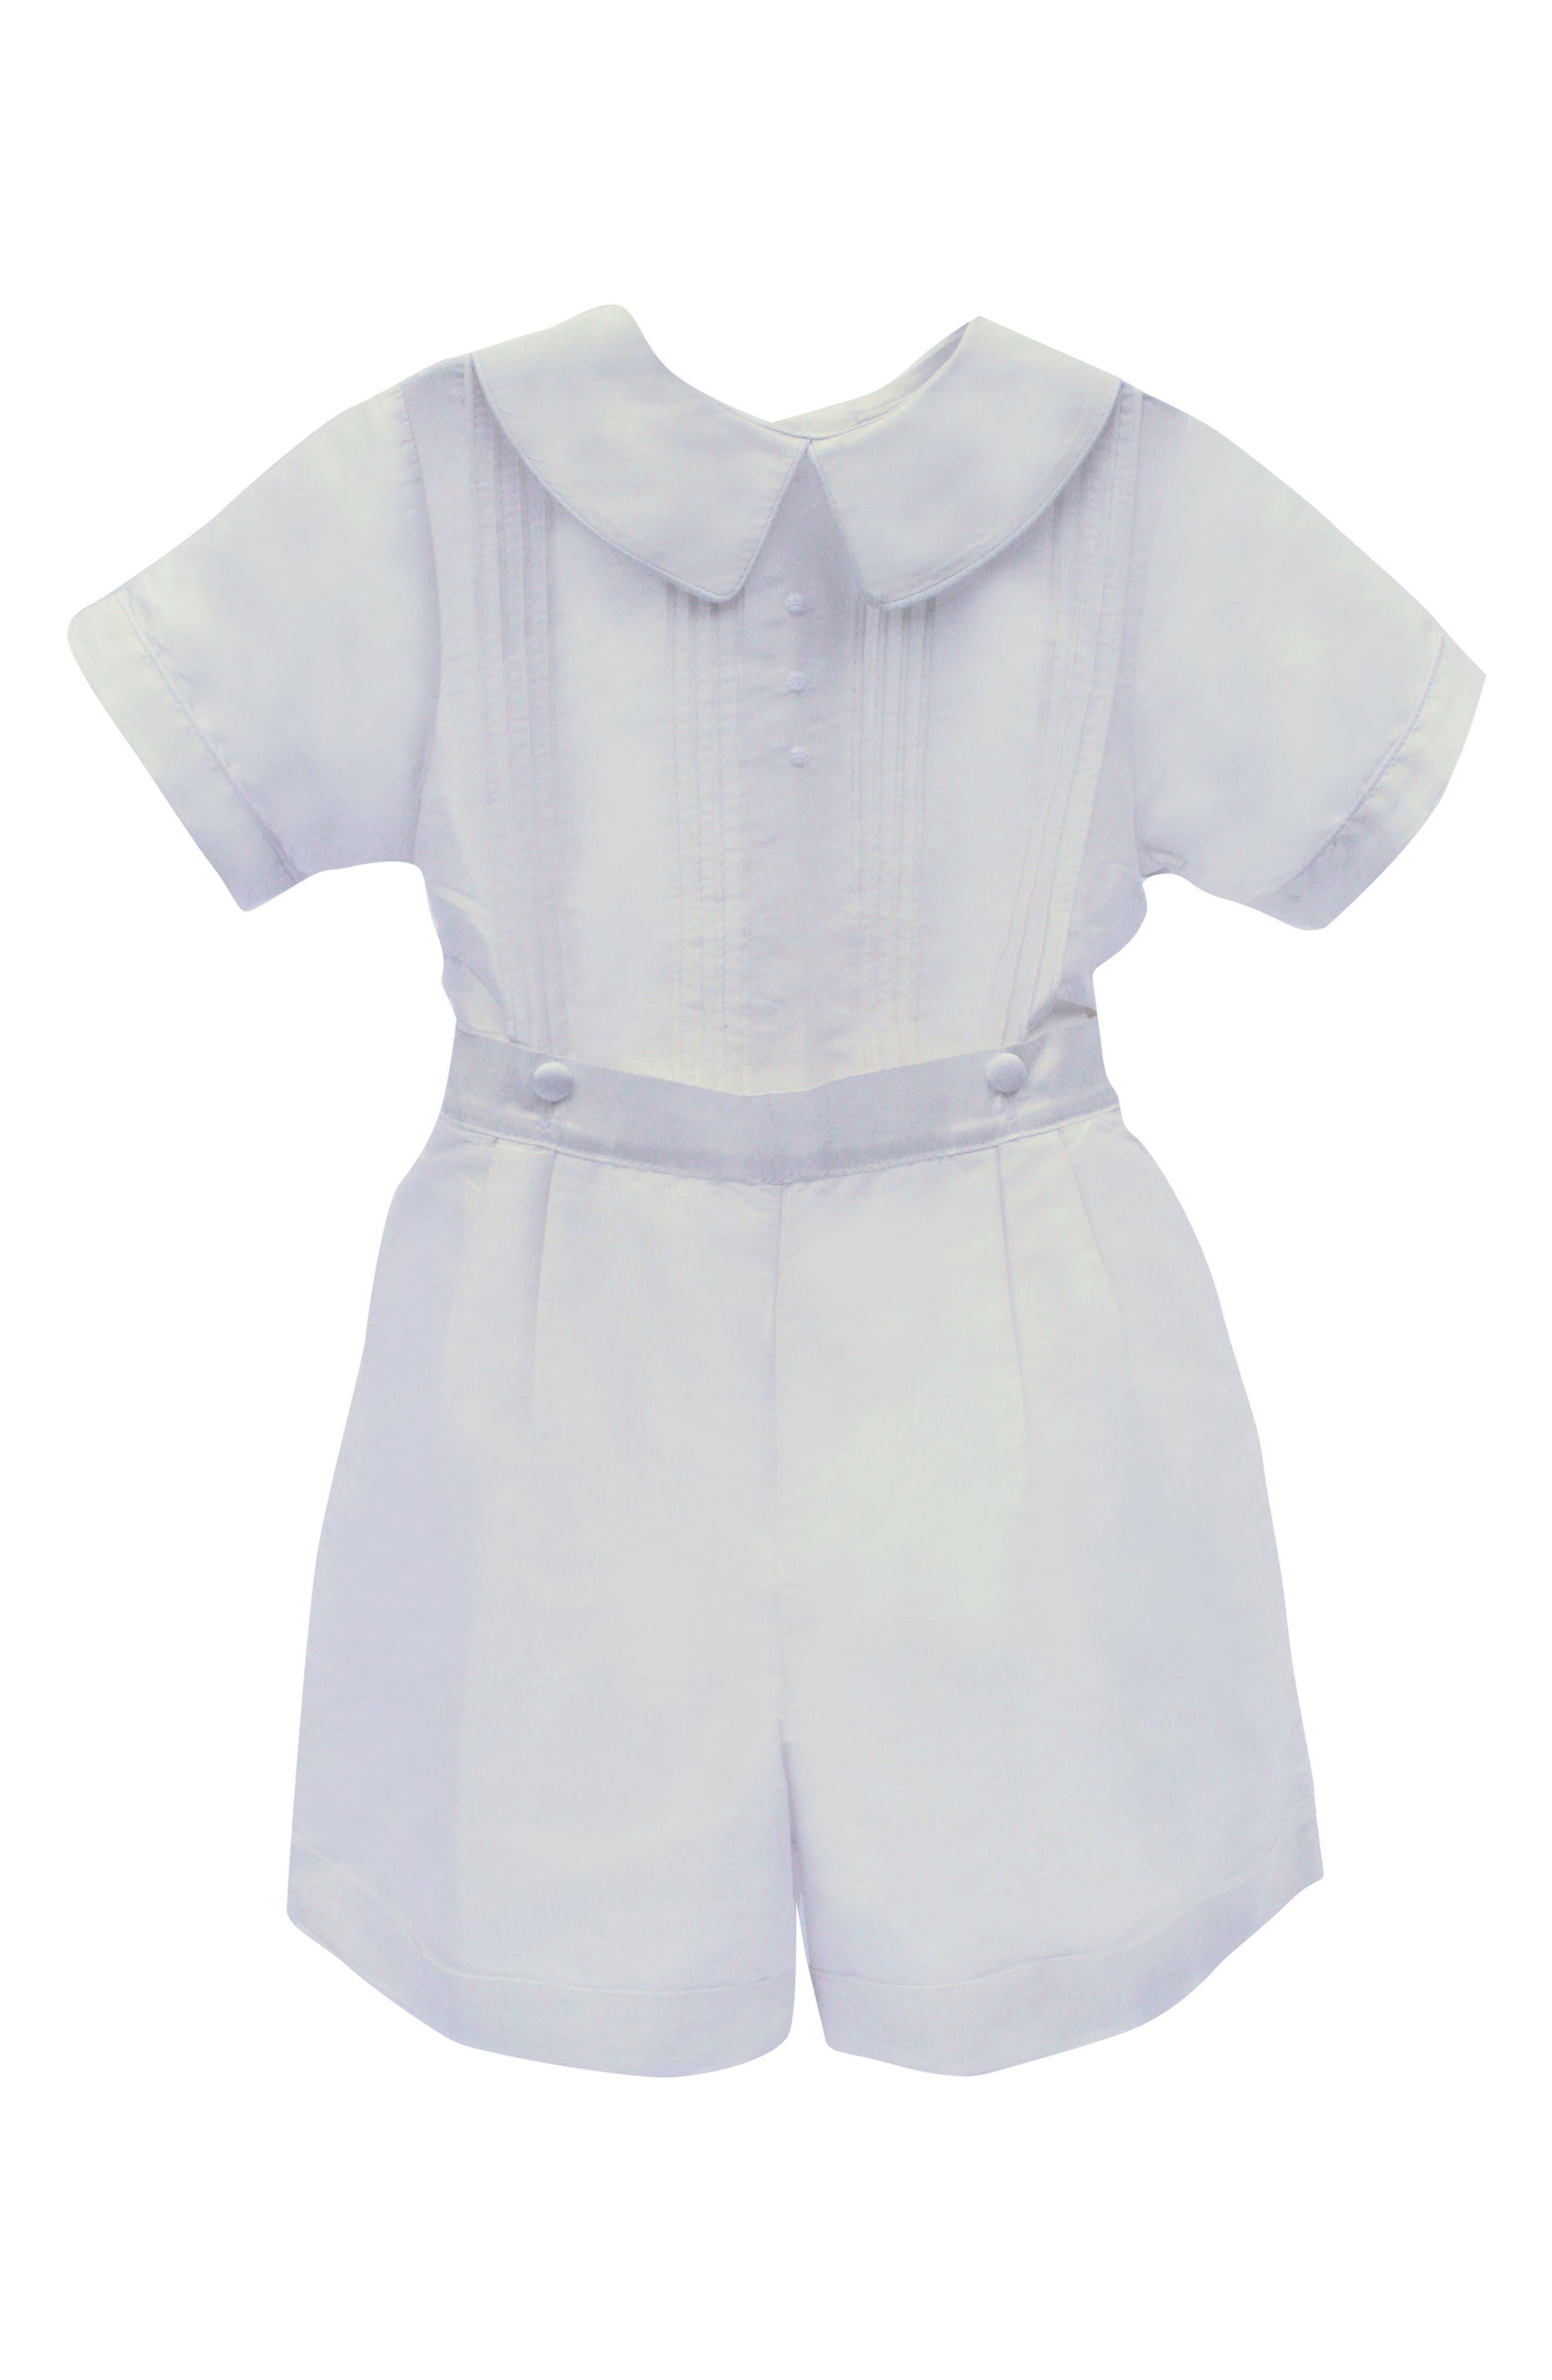 Main Image - Isabel Garreton Sebastian Shirt & Pants Set (Baby Boys)